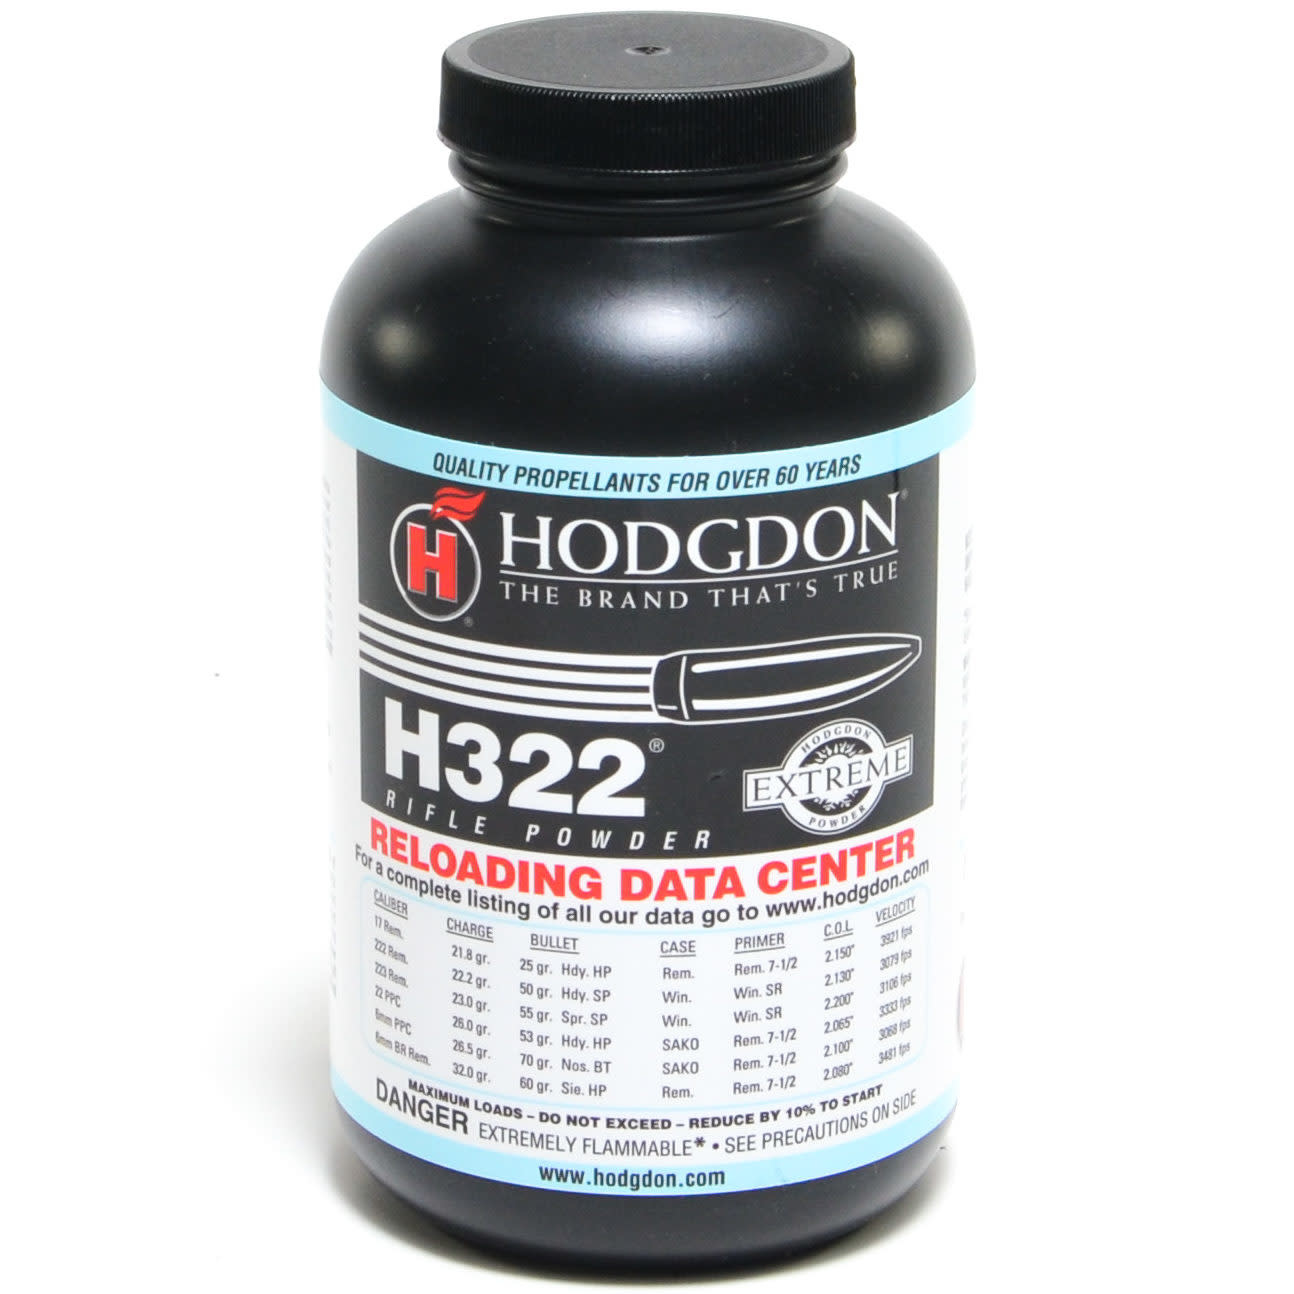 Hodgdon H322 Powder 1 lb